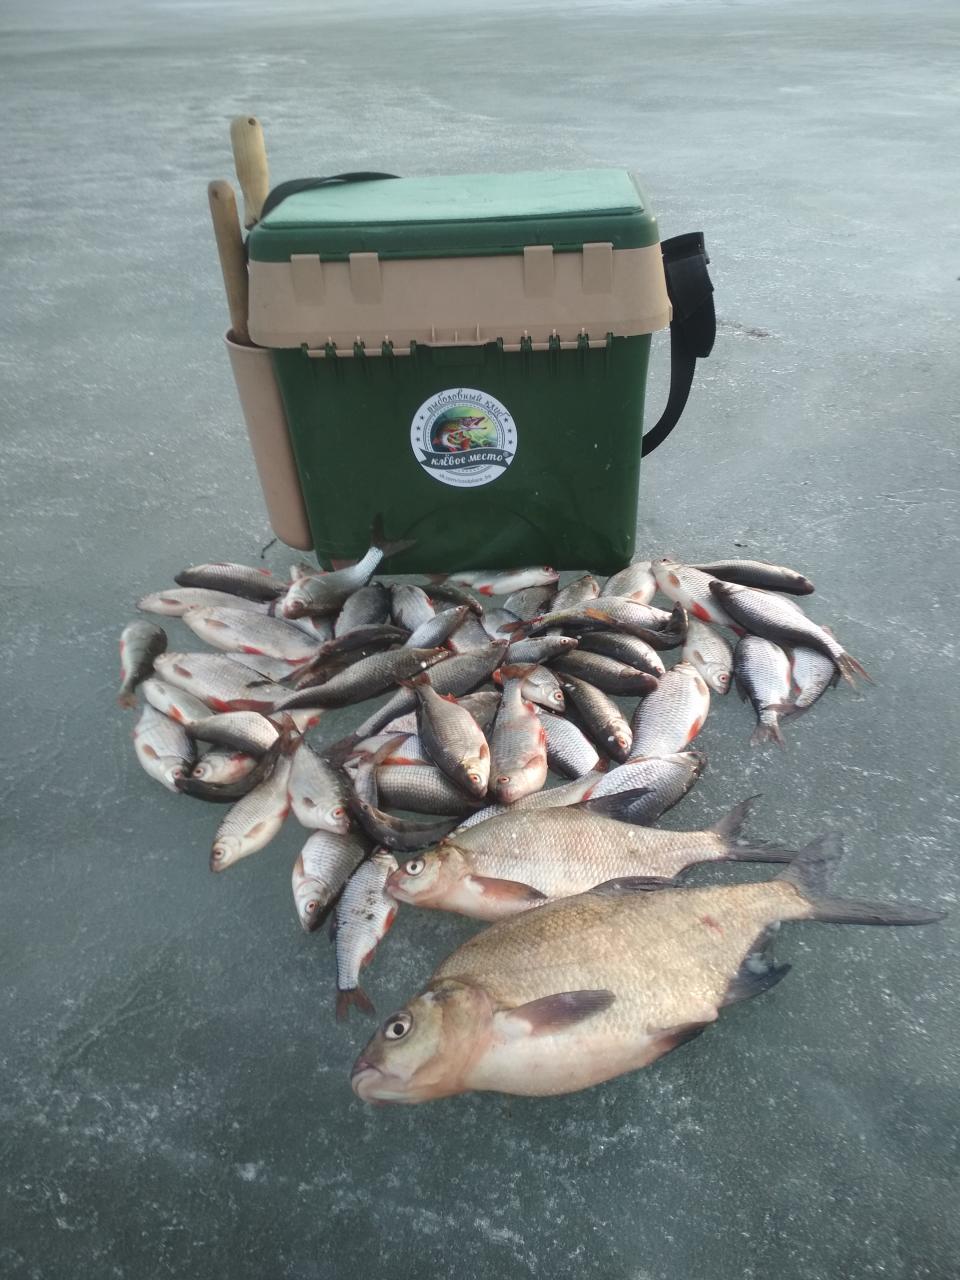 Вчера были в Рыбчино.Заход на лёд без проблем.Глубина ... | Отчеты о рыбалке в Беларуси